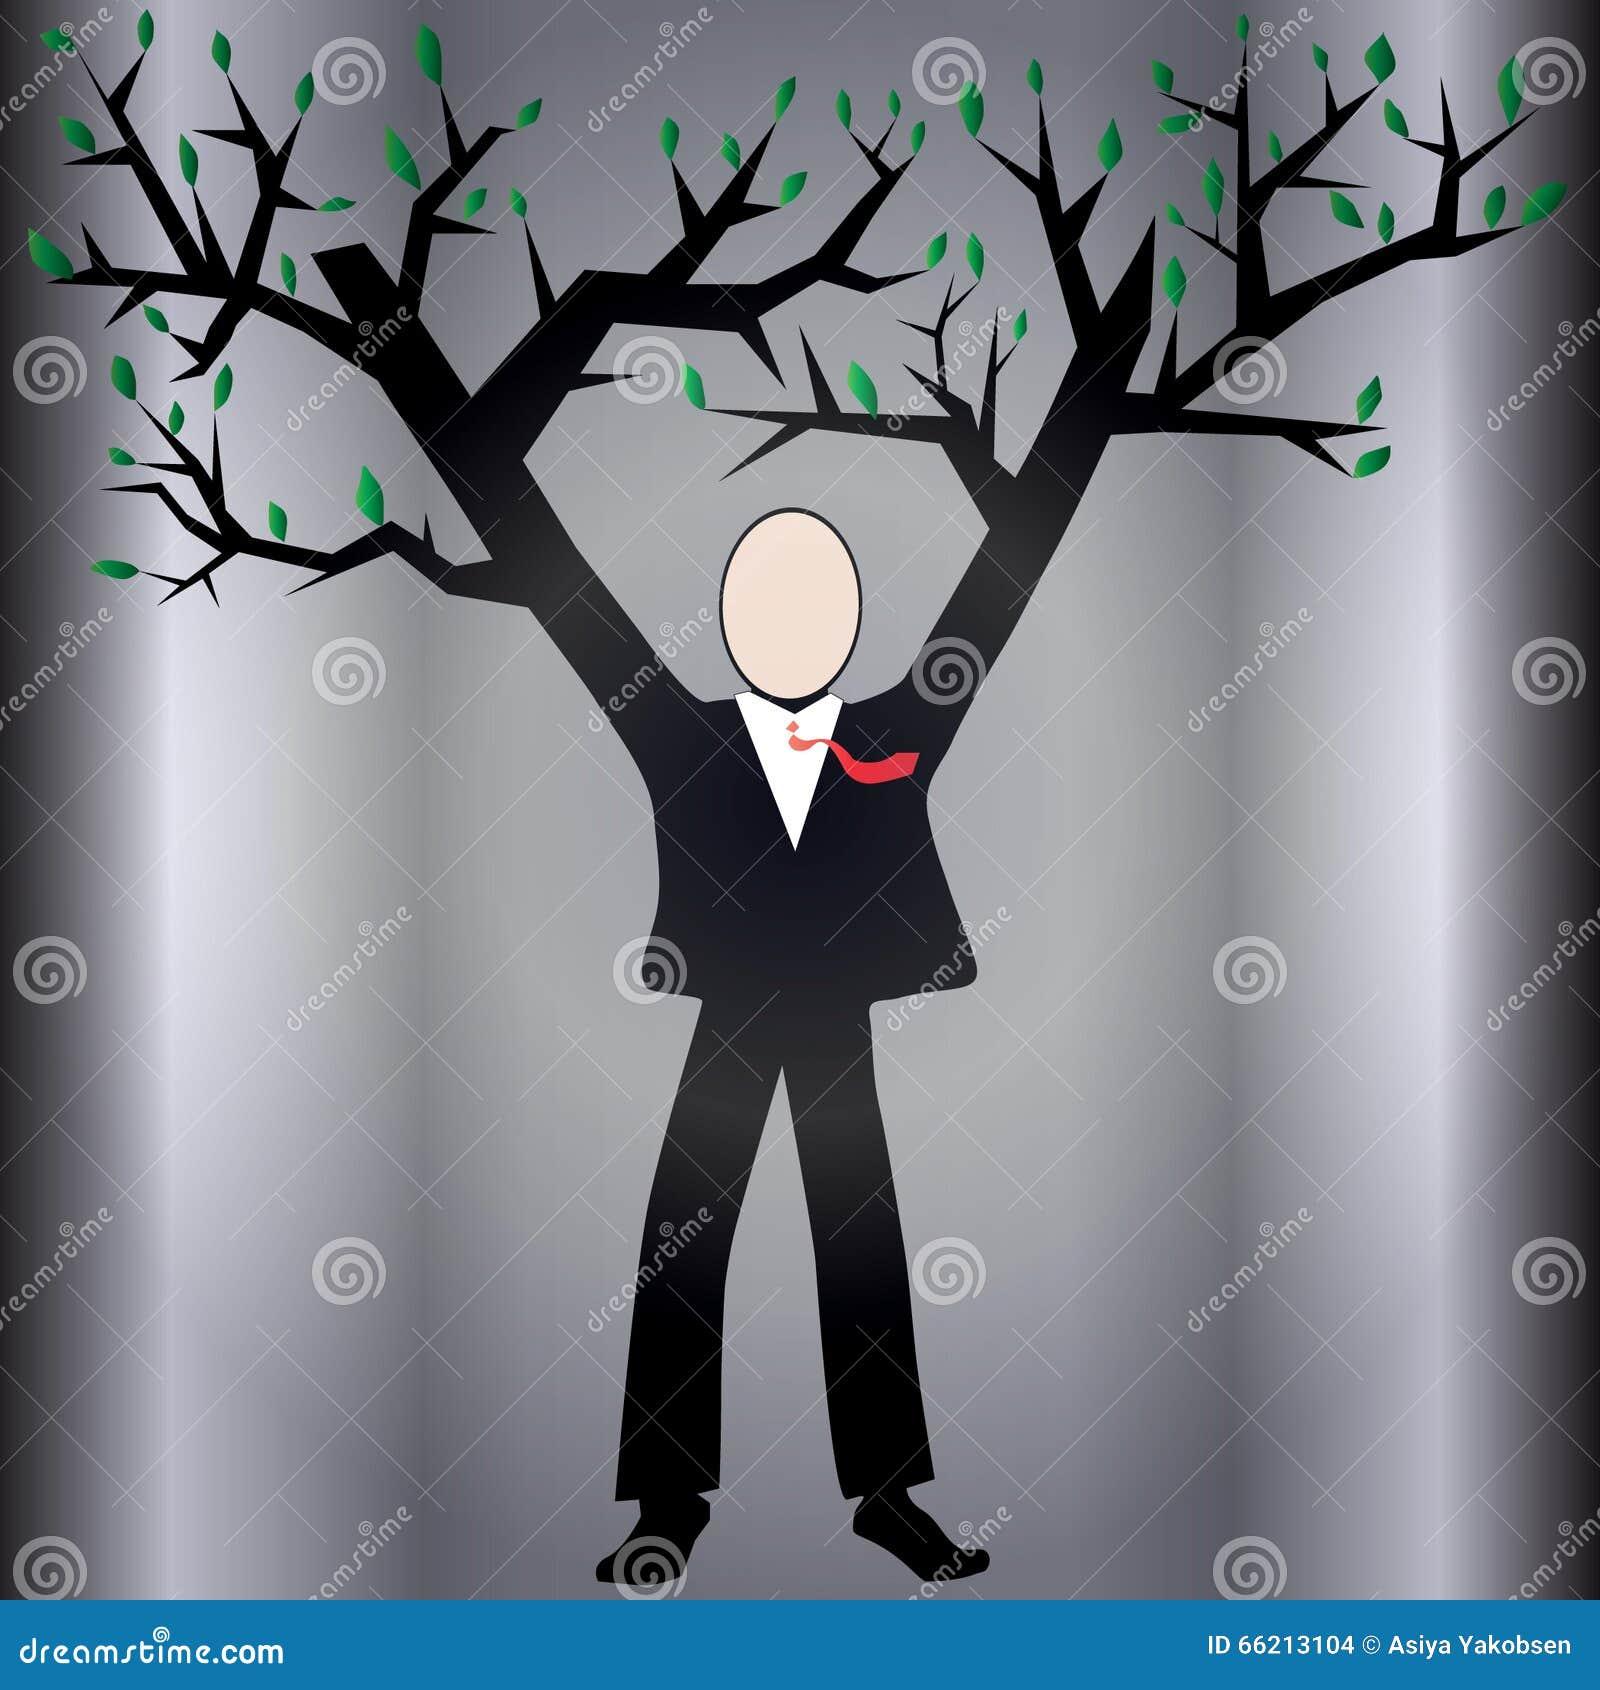 Growing business stock illustration. Illustration of hands - 66213104